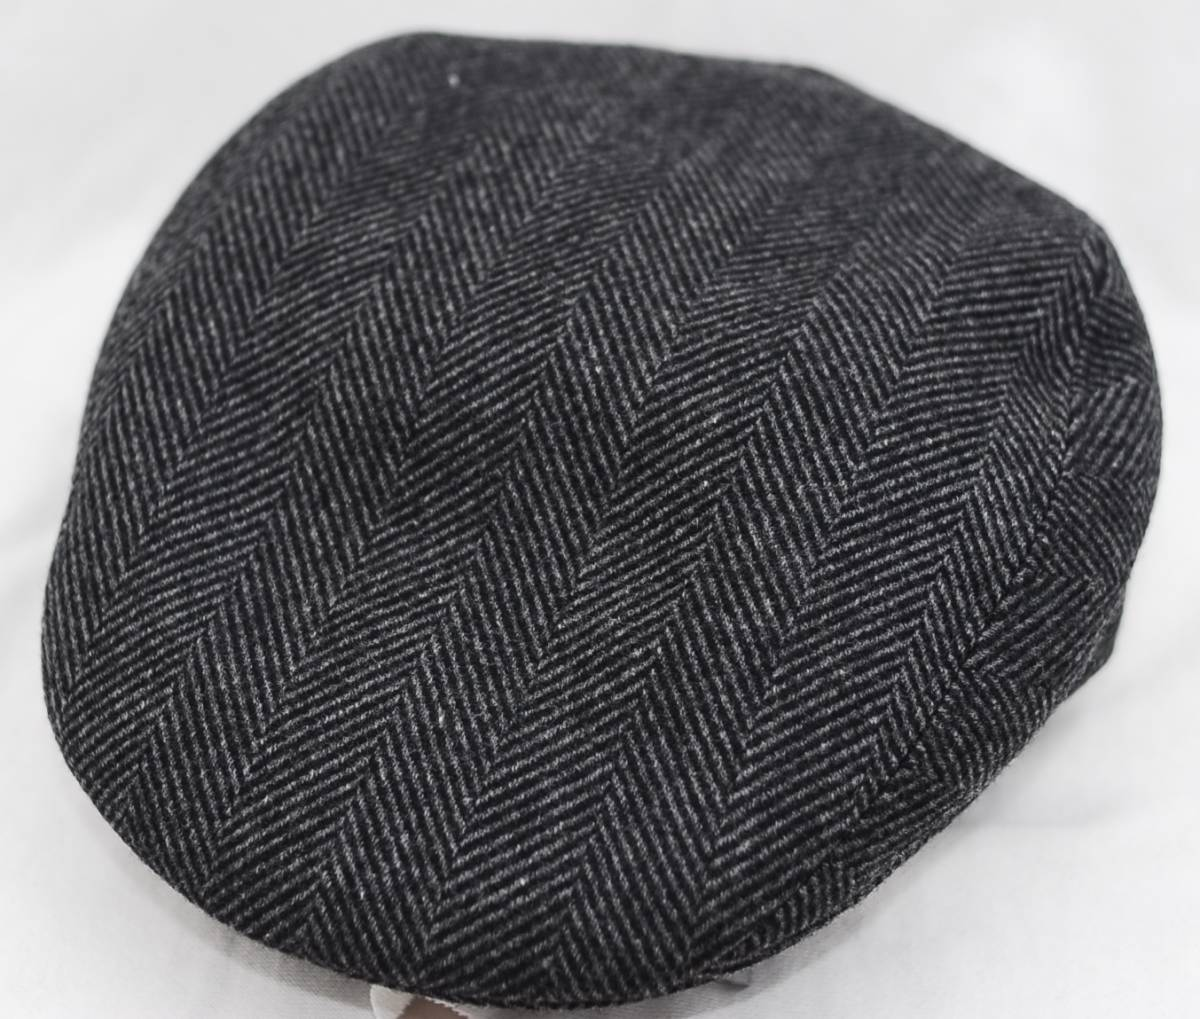 HERMES エルメス ハンチング帽 リネン カシミア グレー ツイード 60